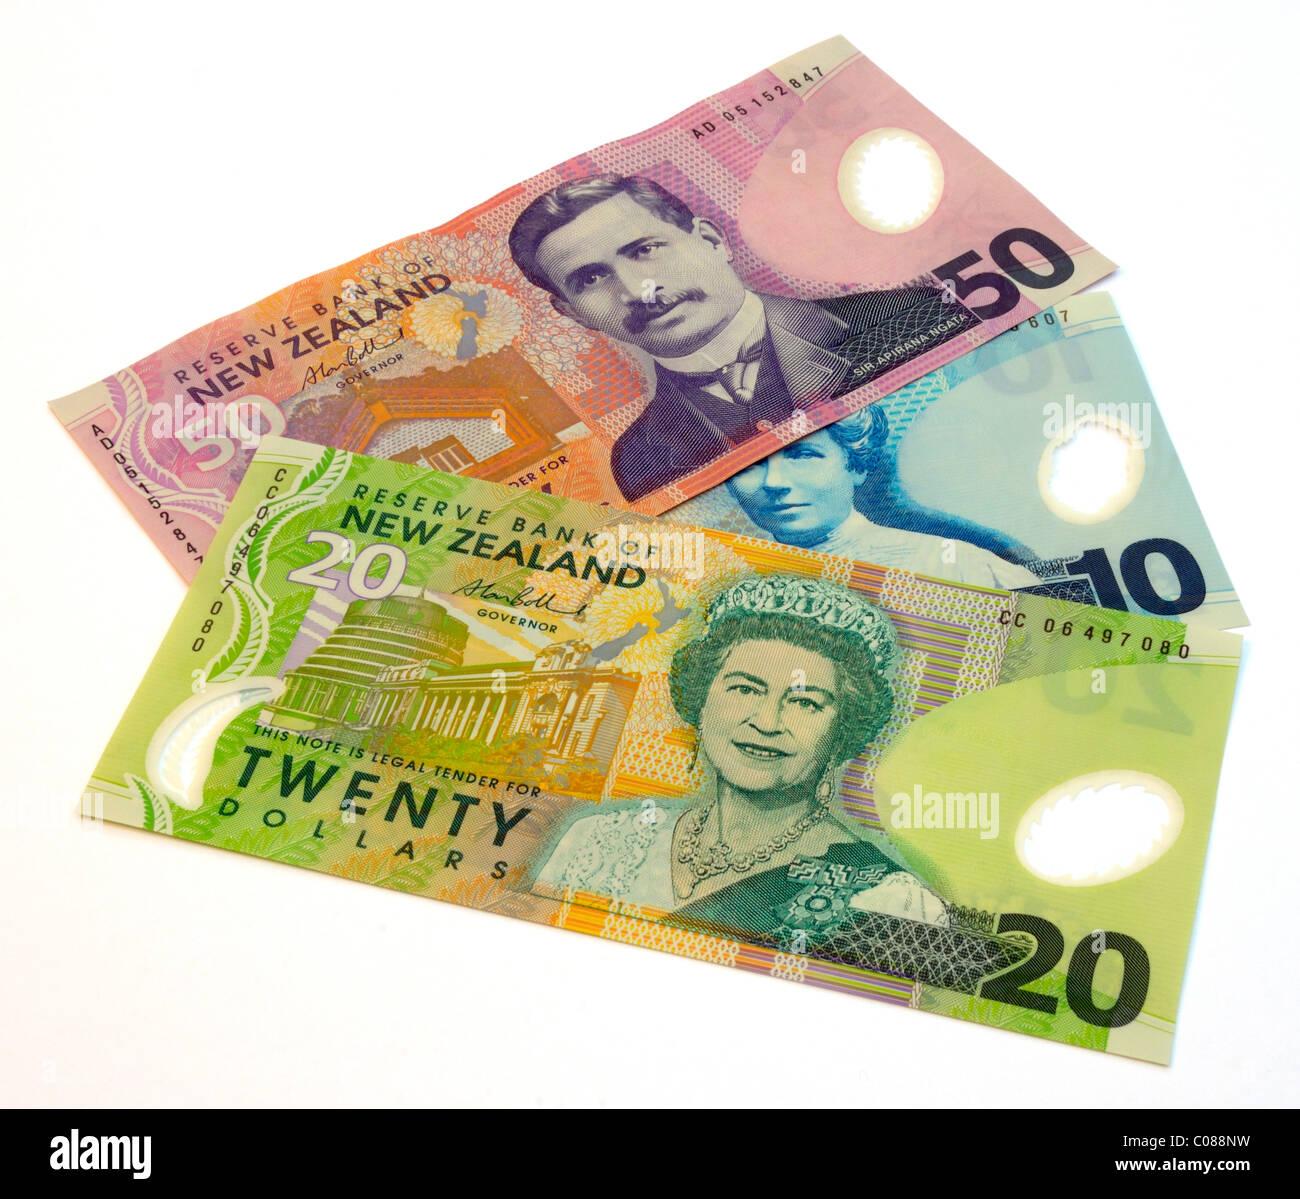 New Zealand Dollar Bank Notes. - Stock Image